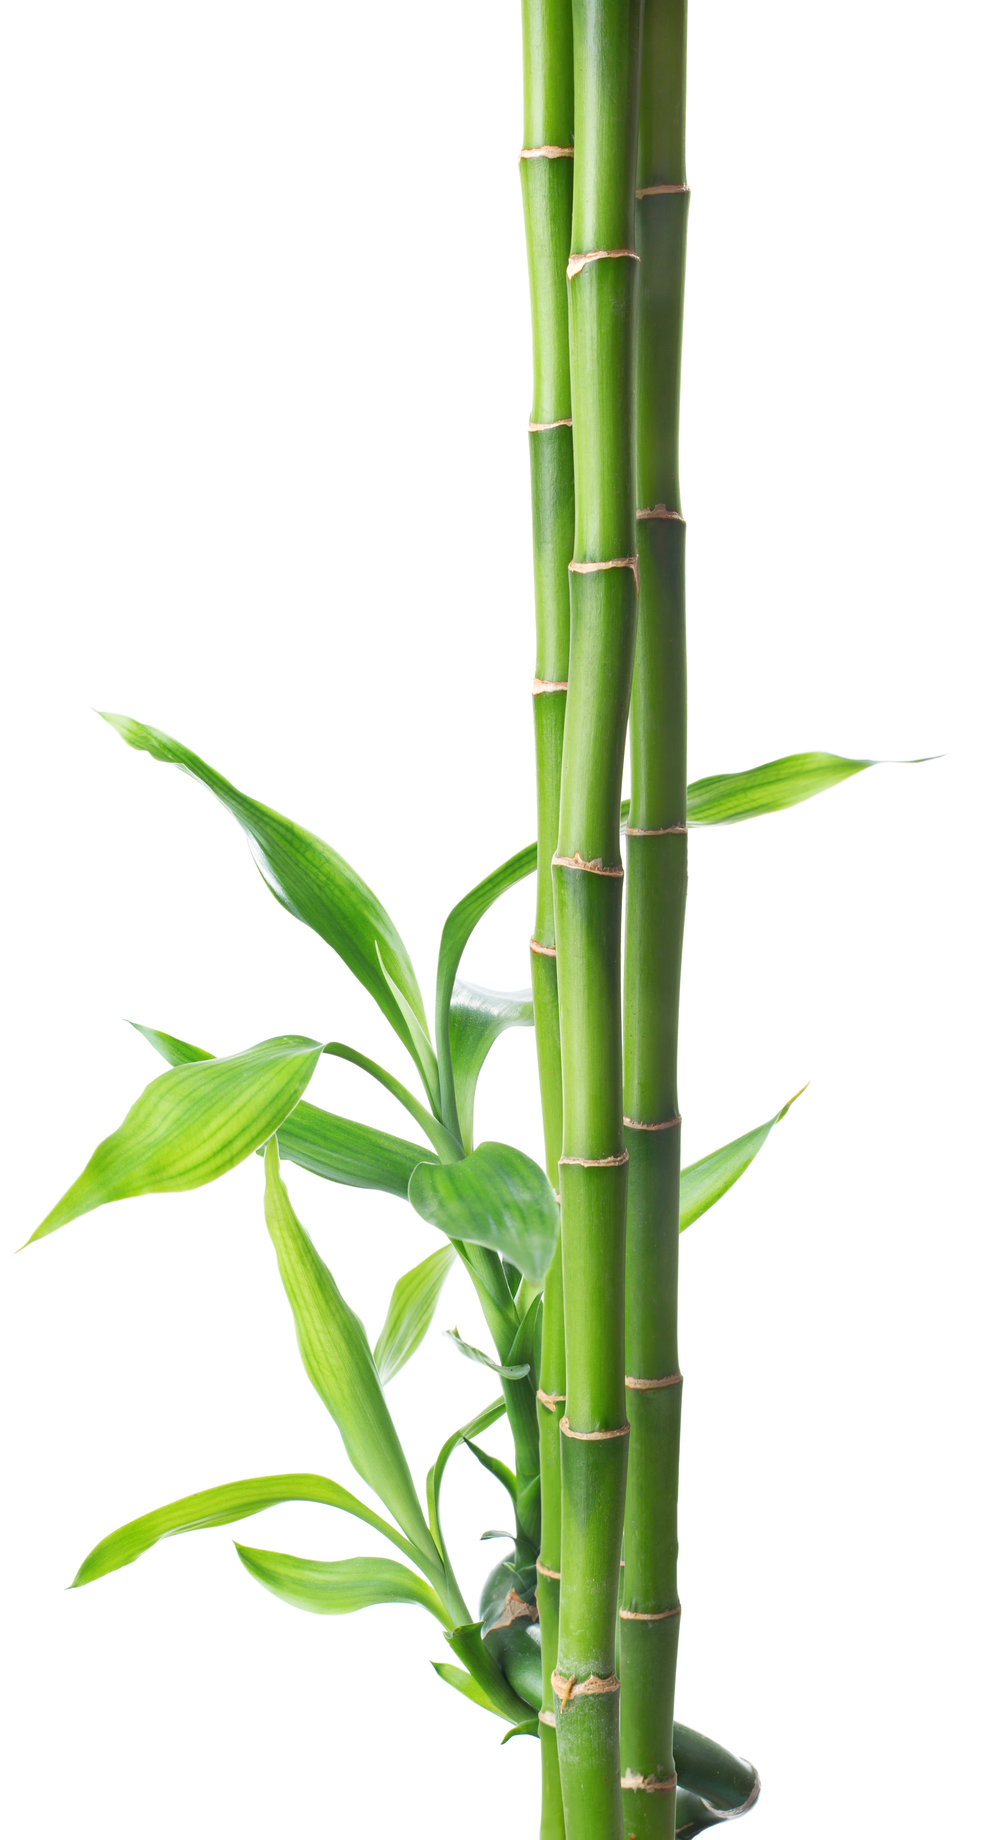 bamboo_cropped.jpg